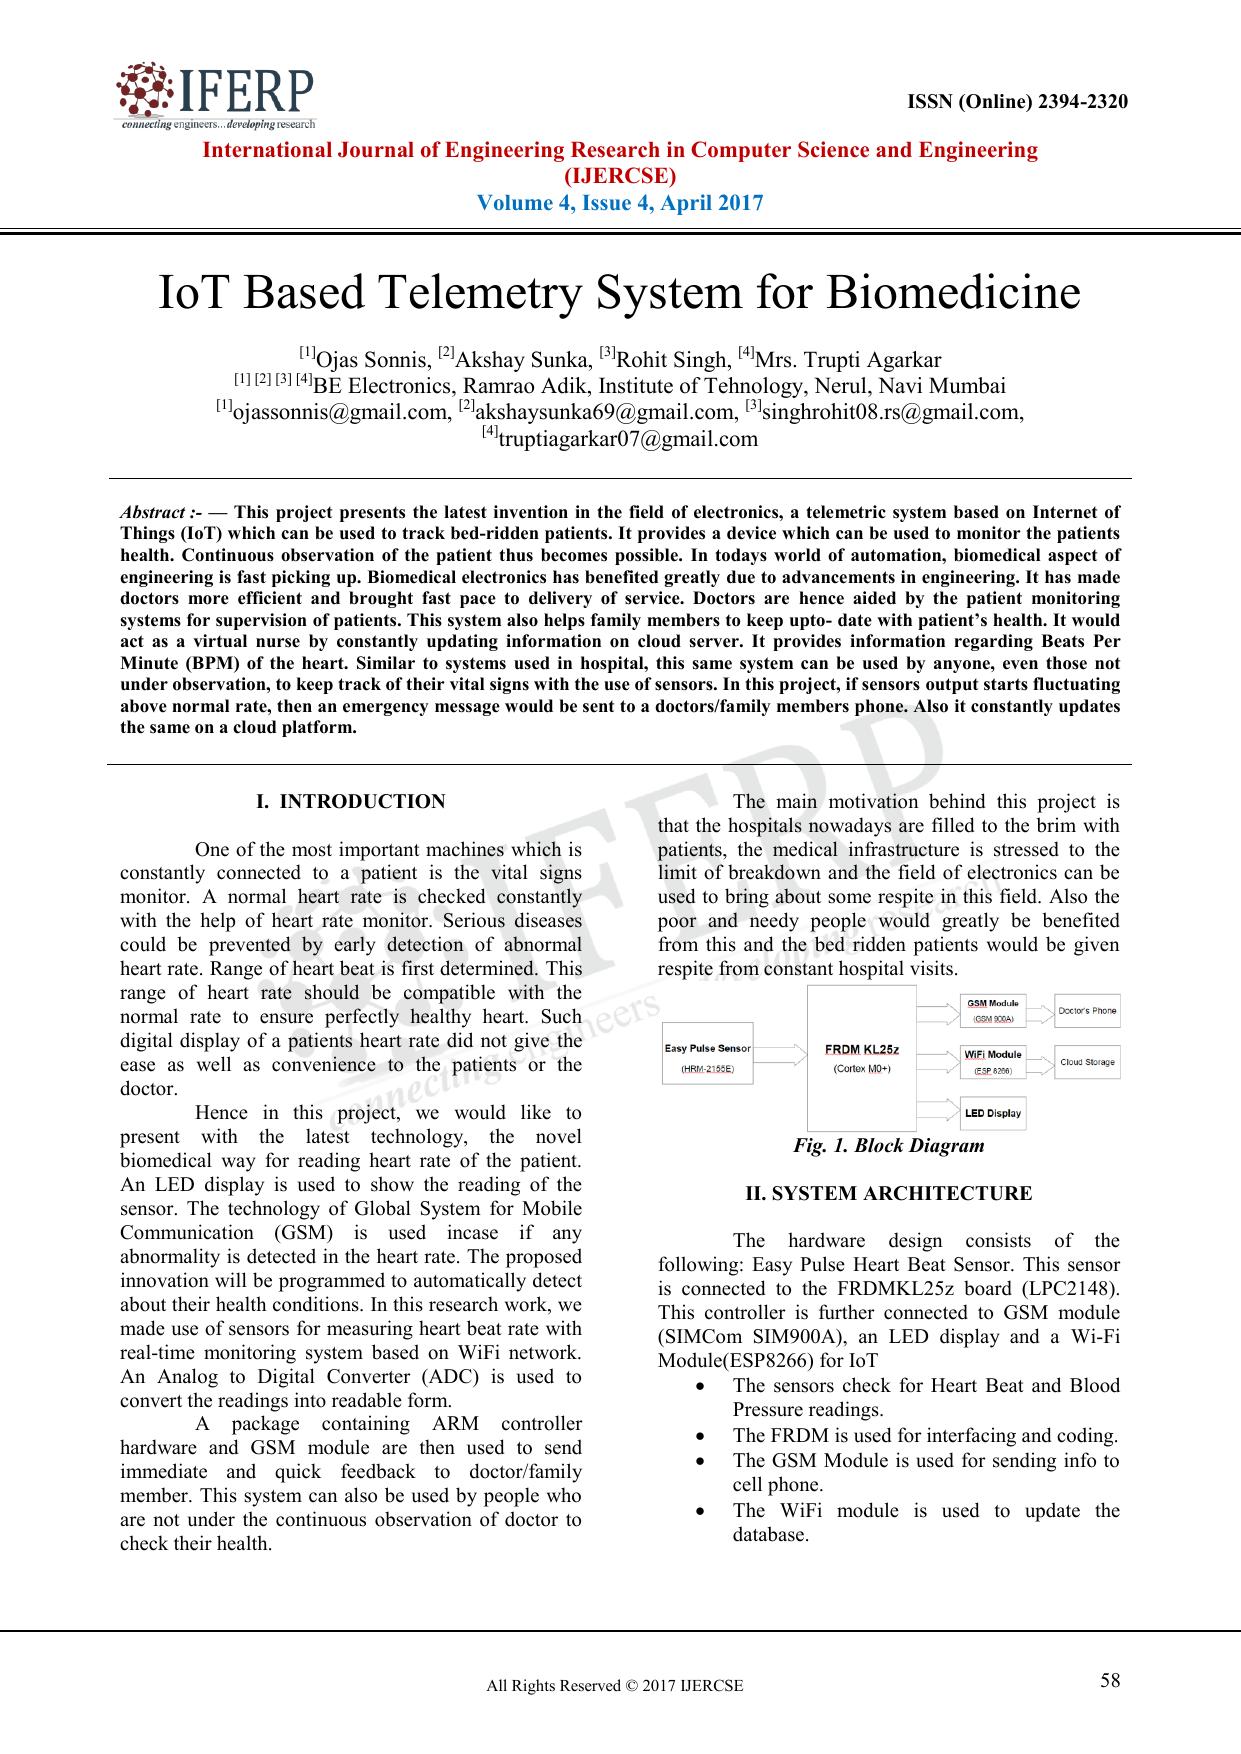 IoT Based Telemetry System for Biomedicine   manualzz com